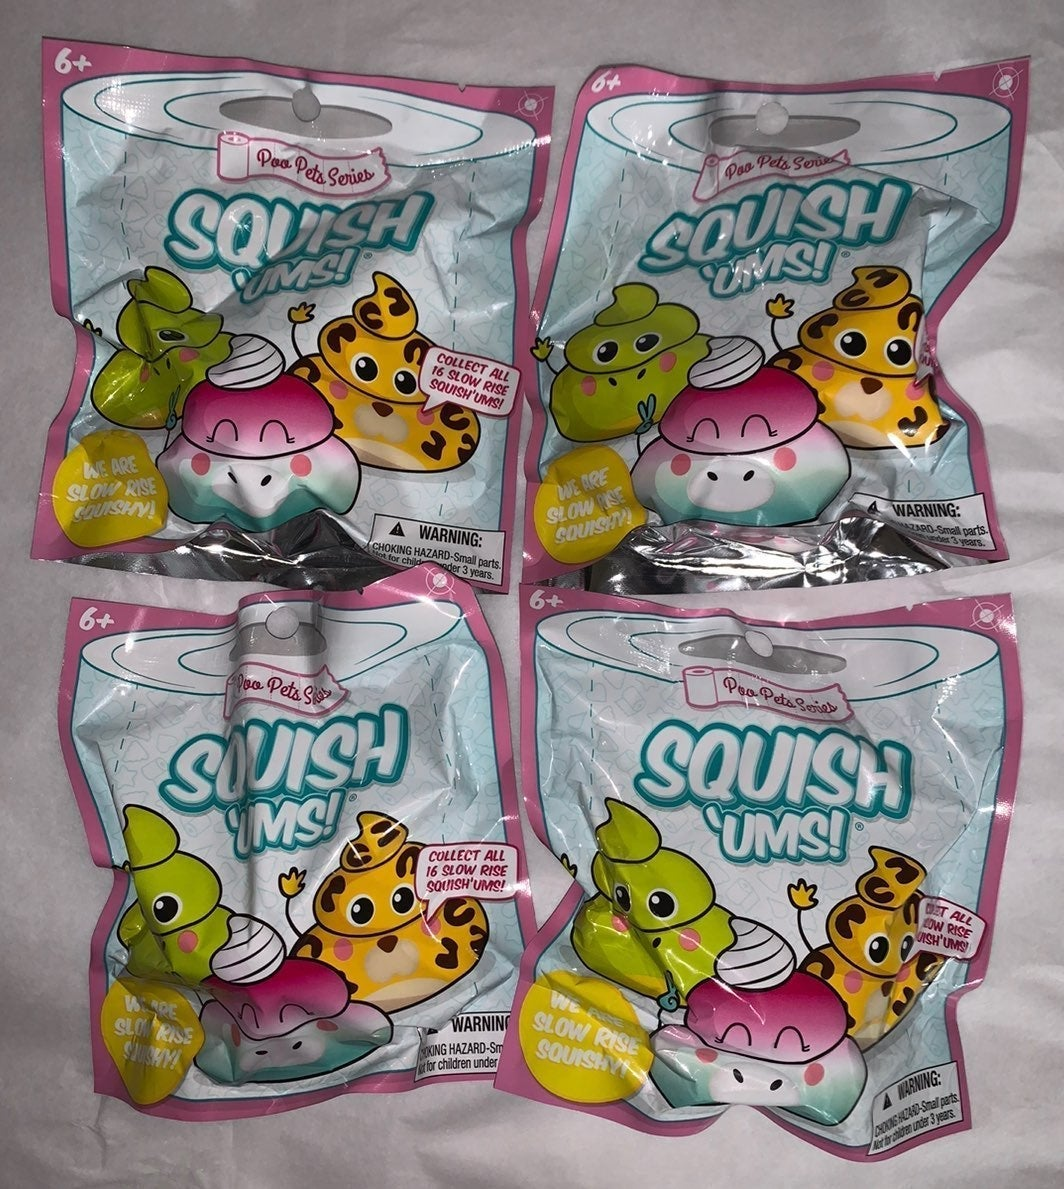 Squish ums poo pets blind bag squishy